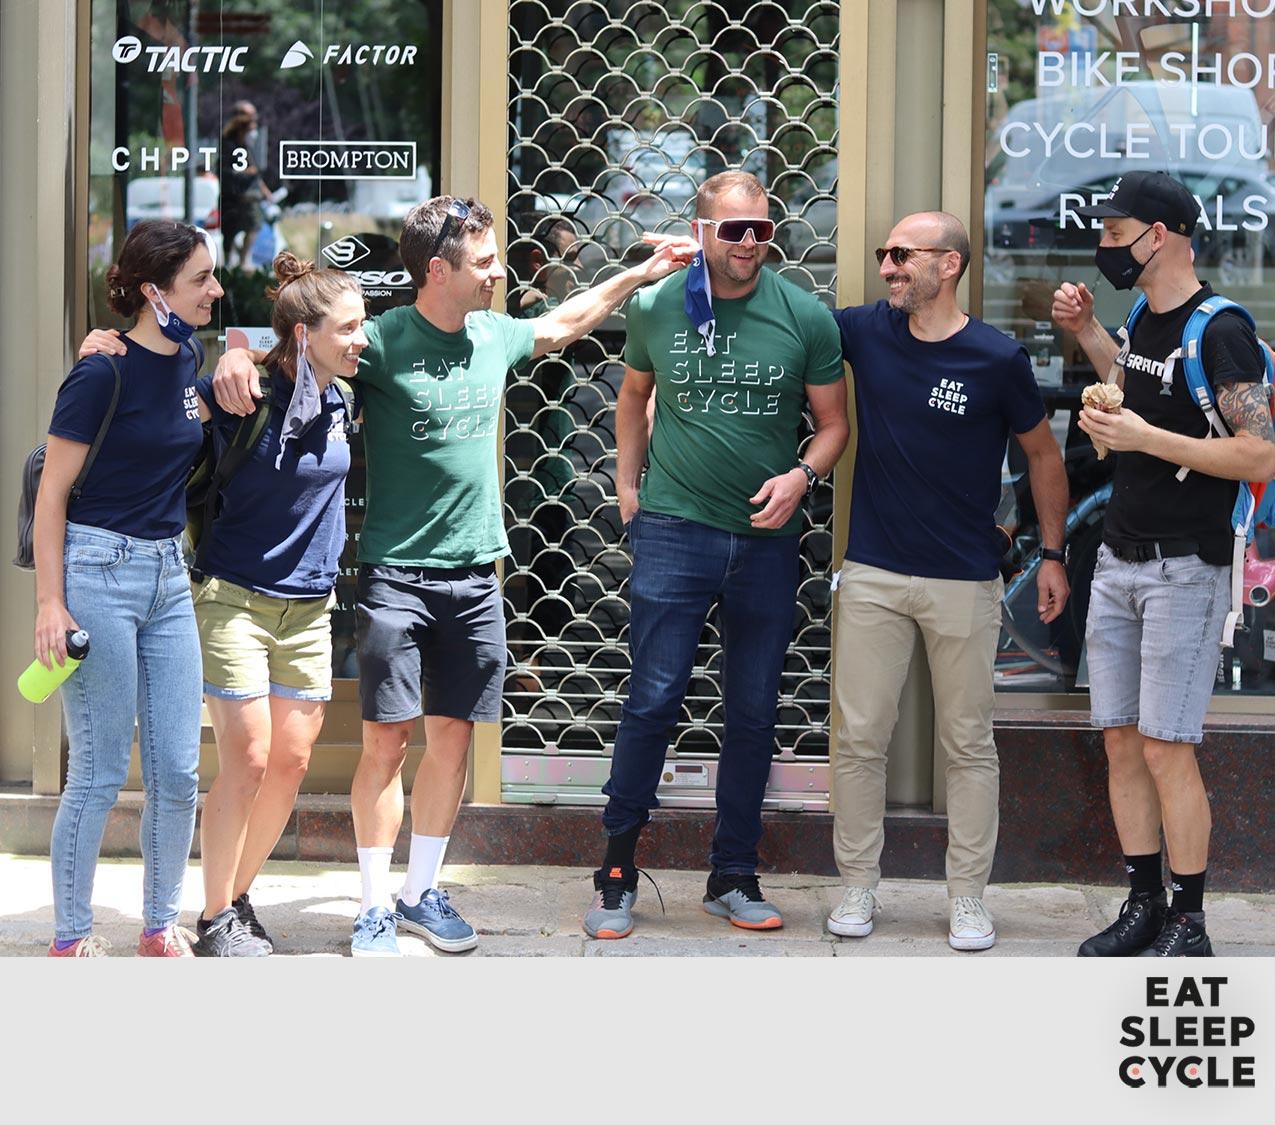 Eat Sleep Cycle Crowdfunding Cafe Girona Cycling Community